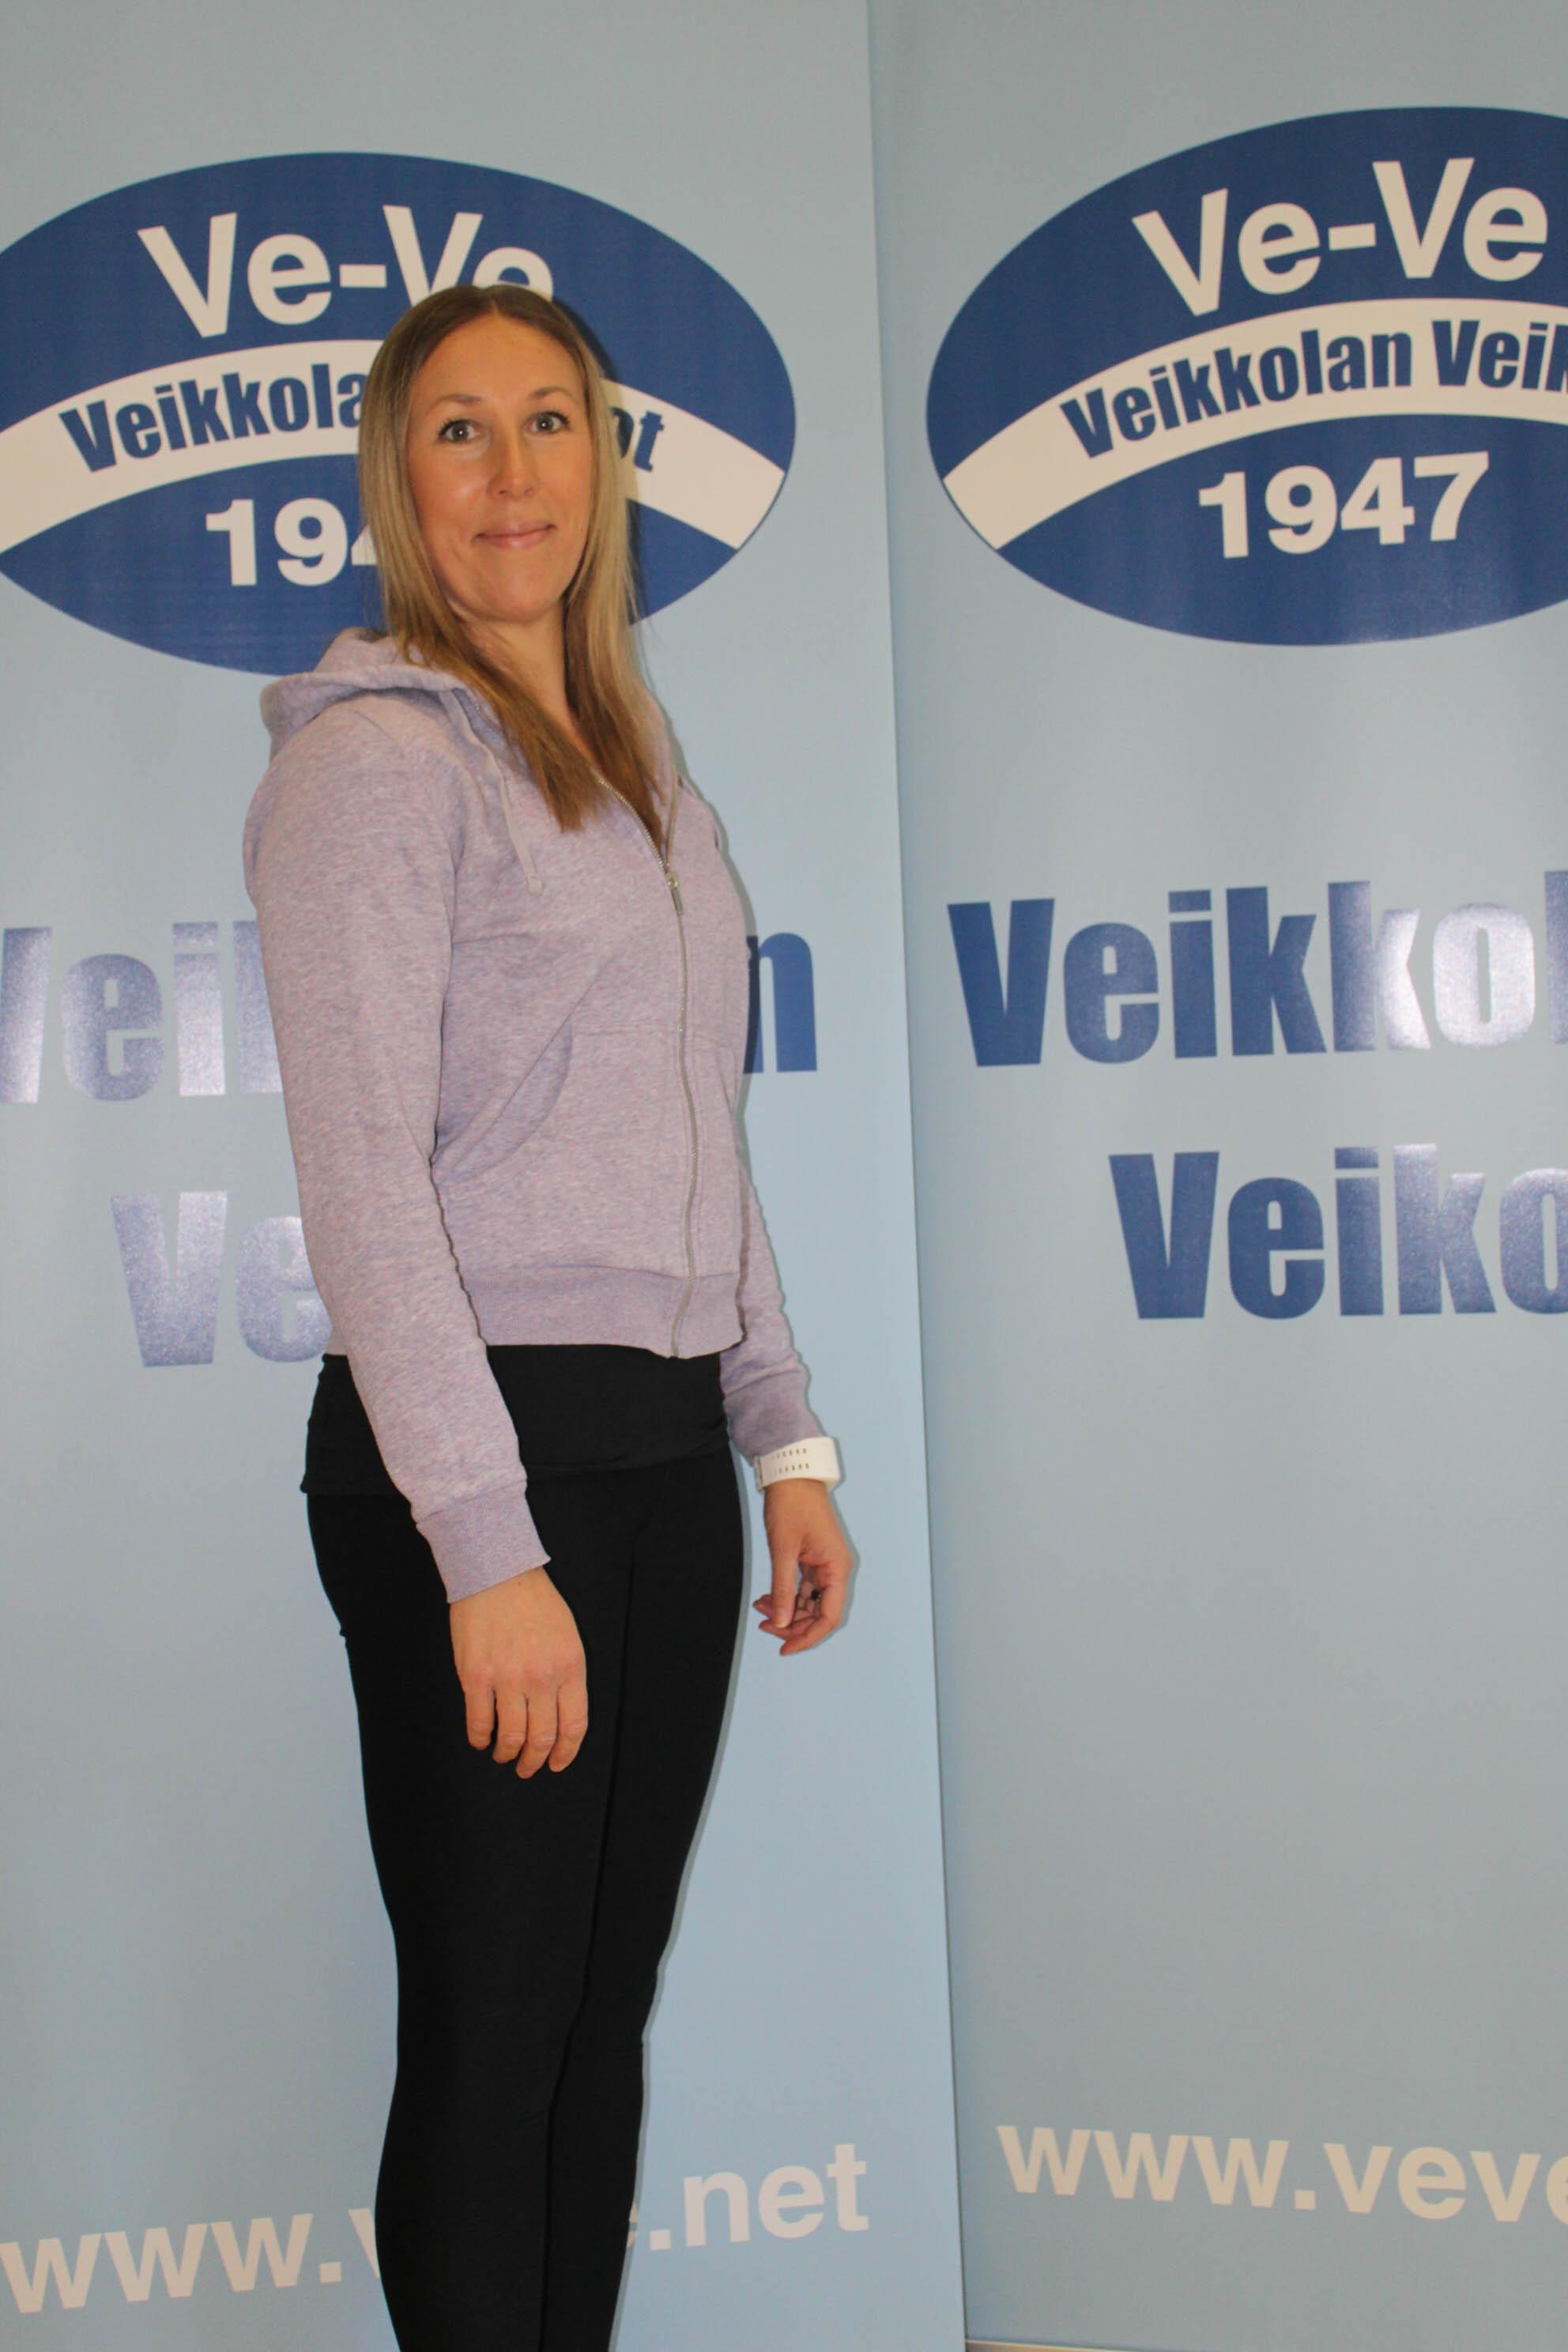 Jutta Nyholm